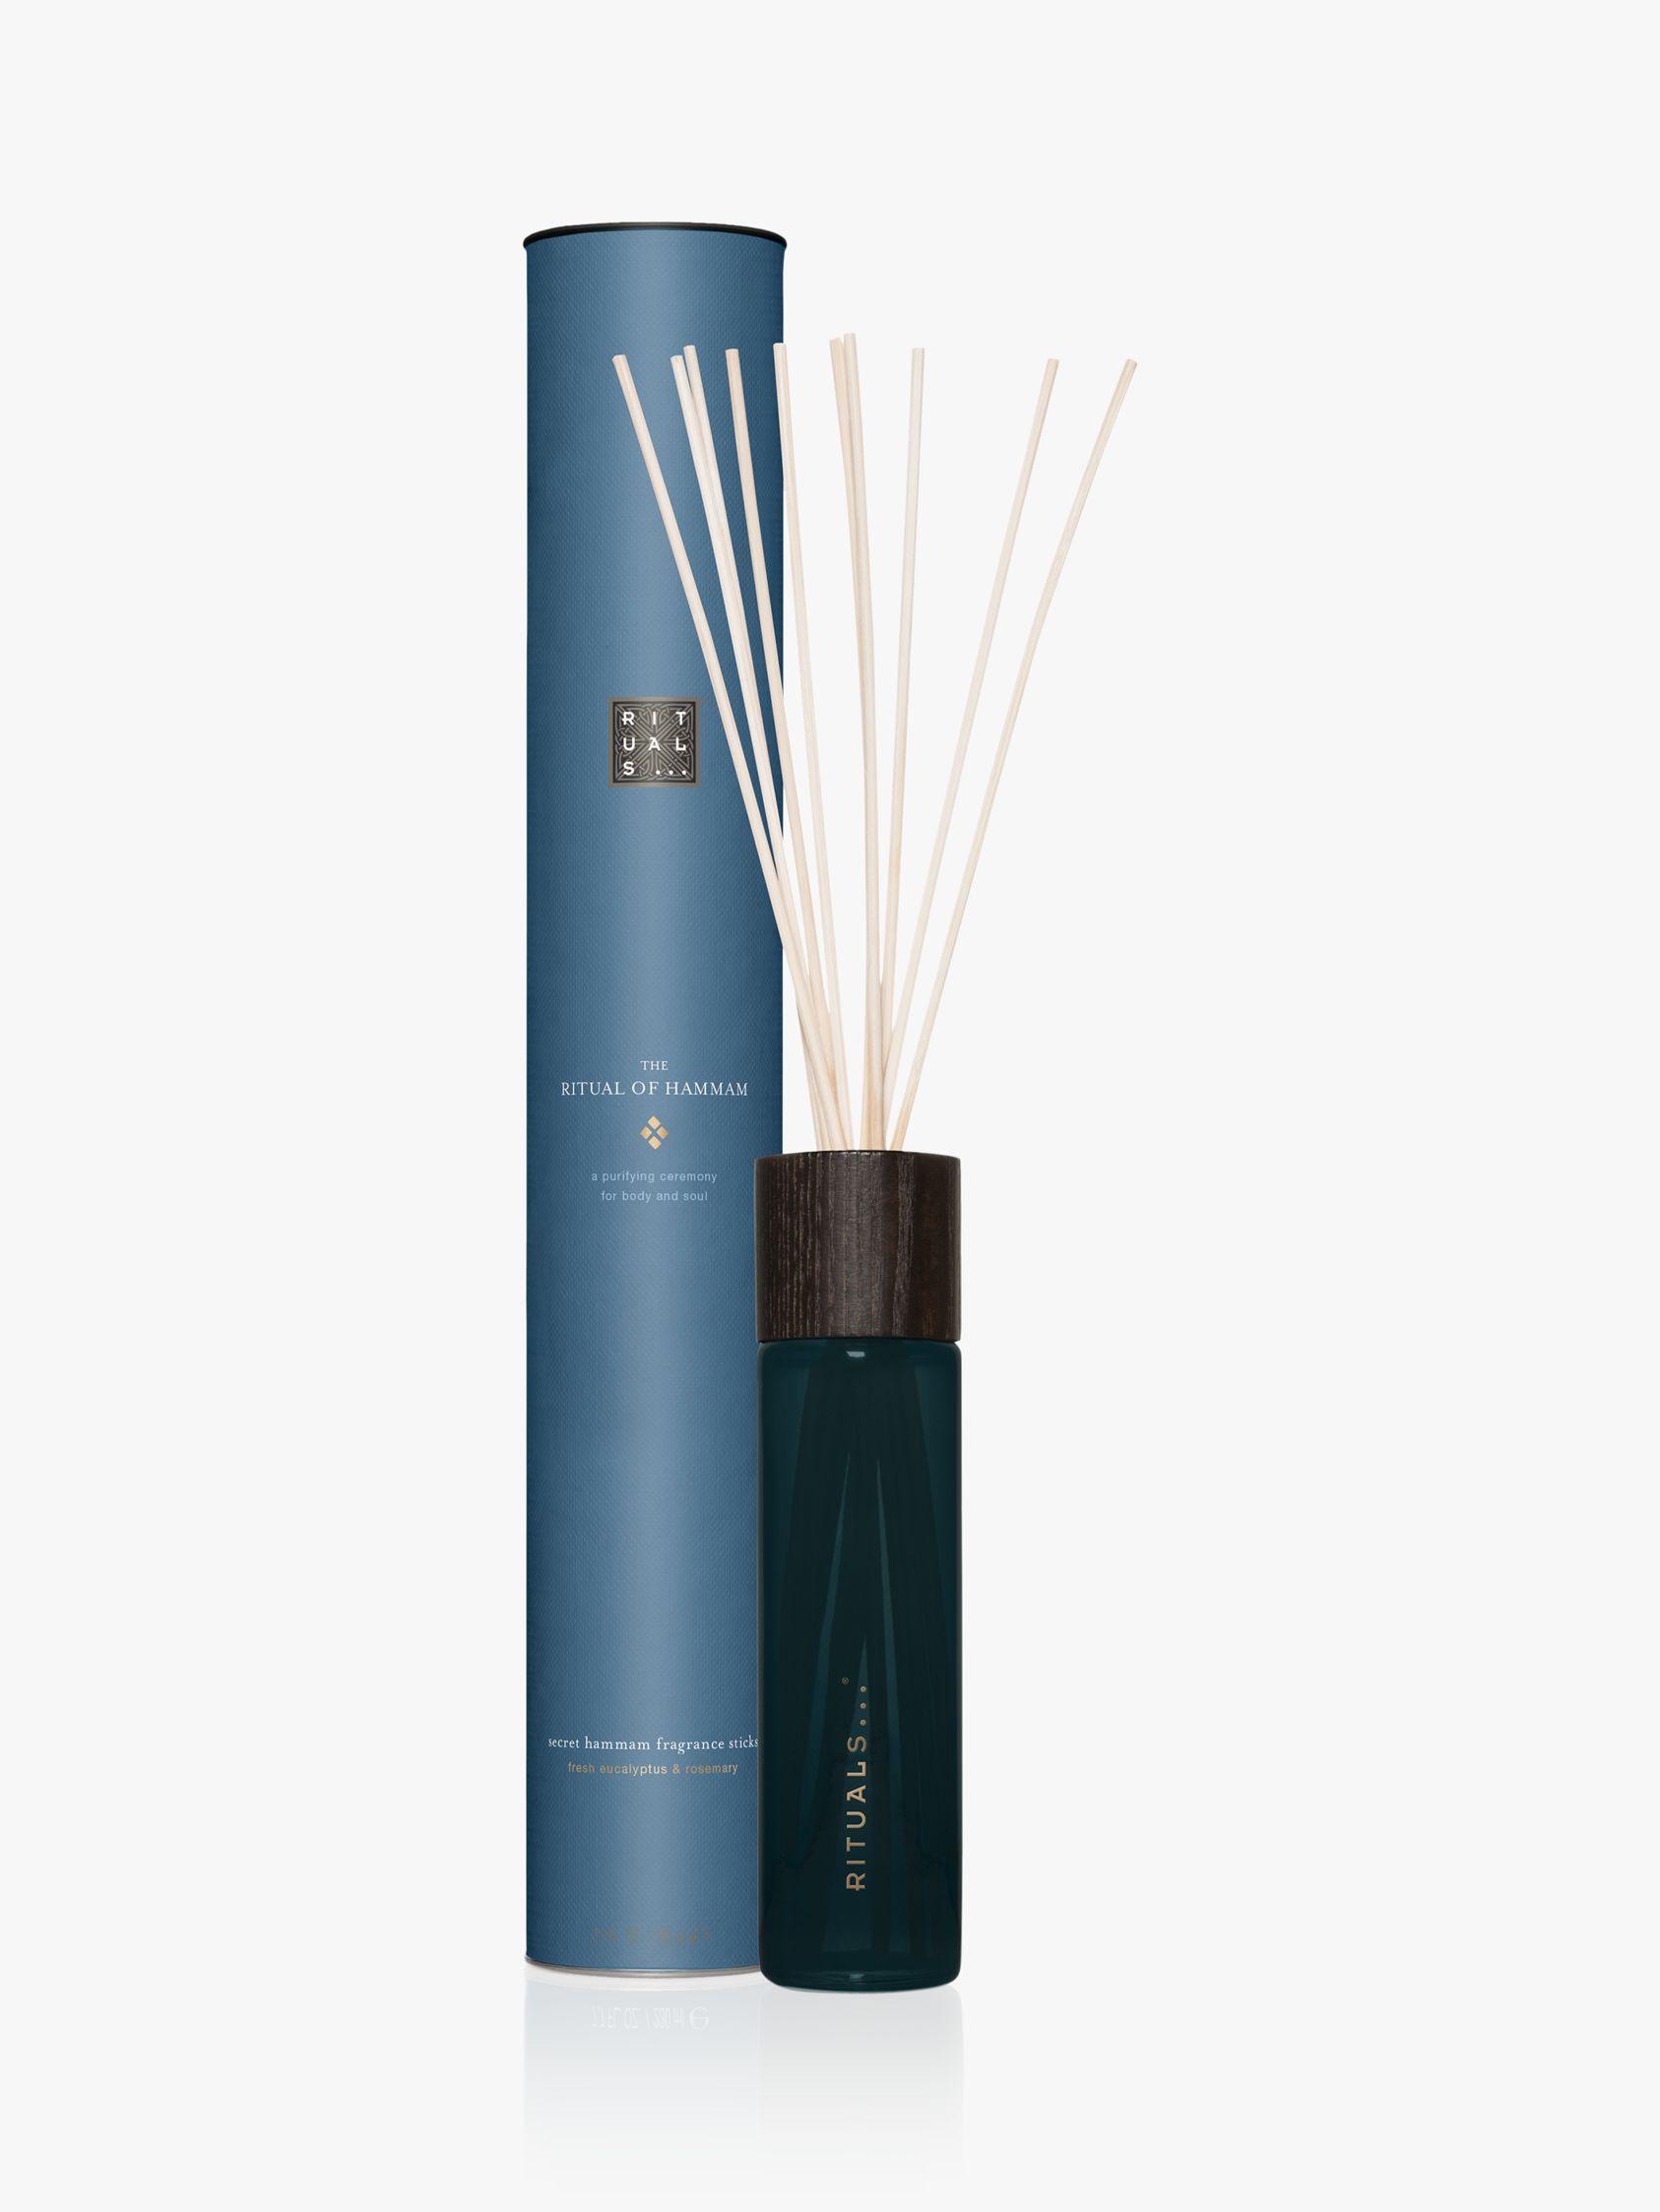 Rituals Rituals The Ritual of Hammam Fragrance Sticks